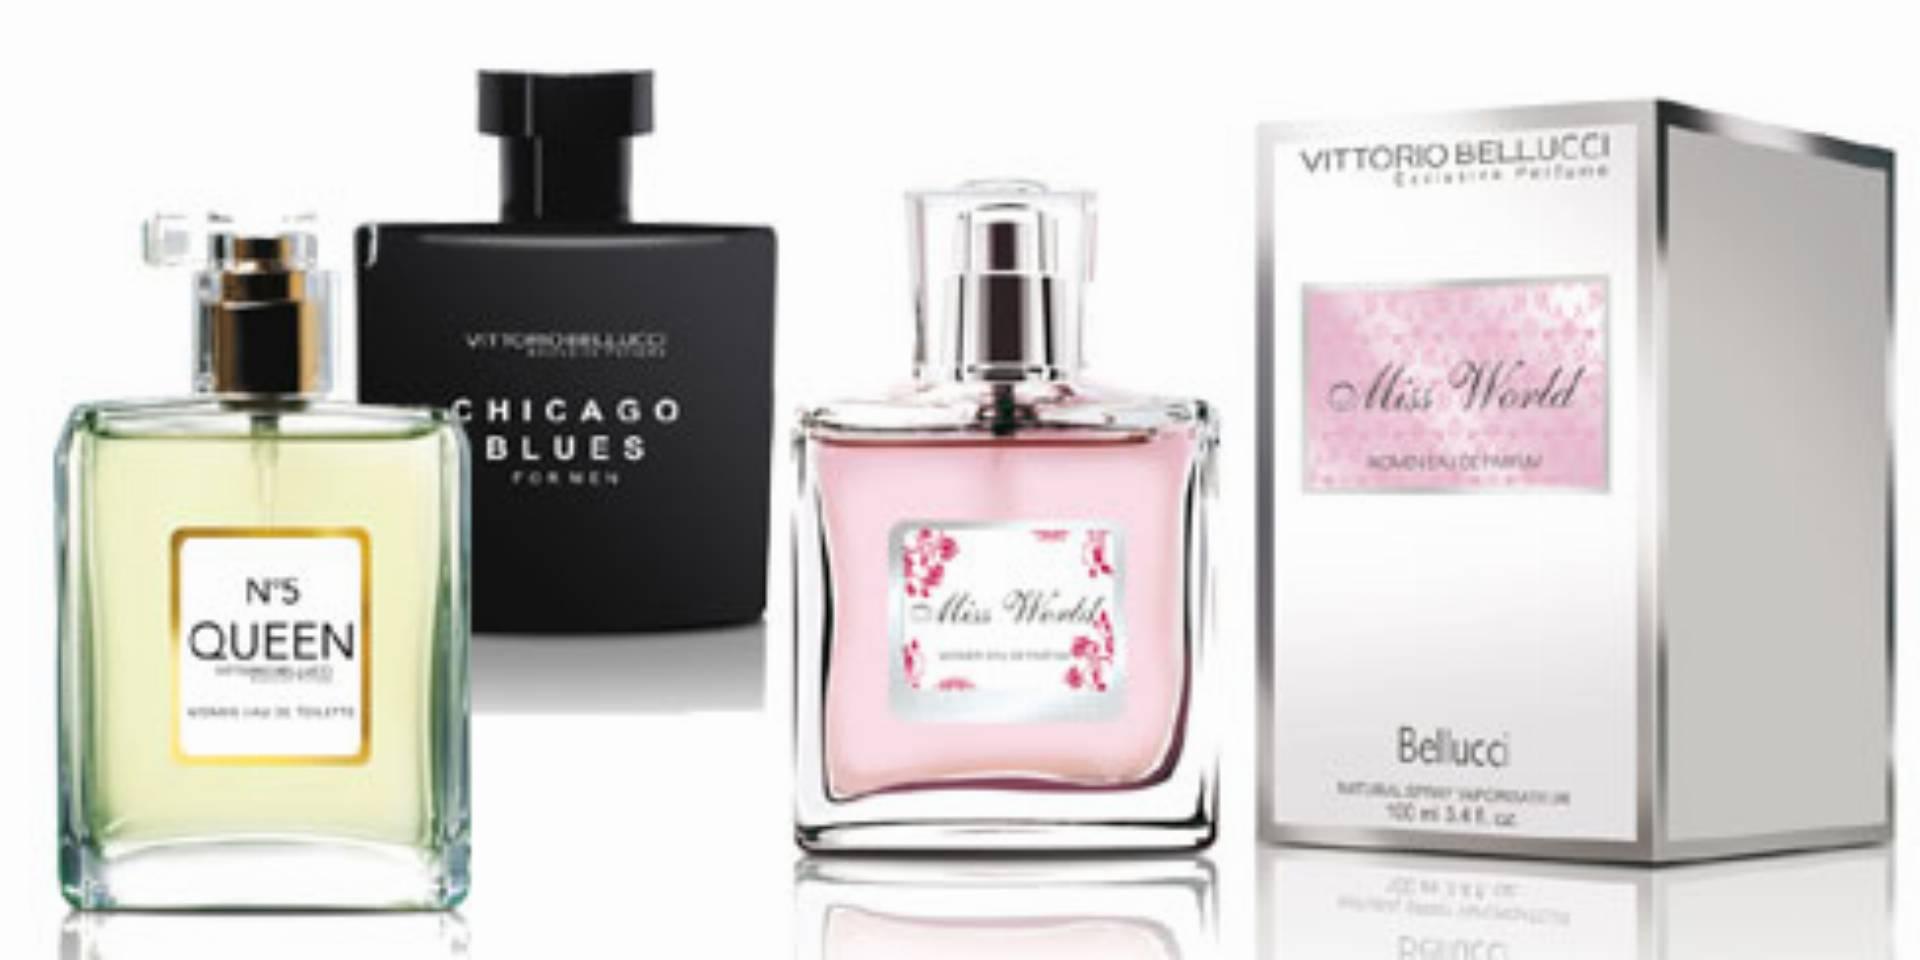 Vittorio Bellucci Exclusive Perfume